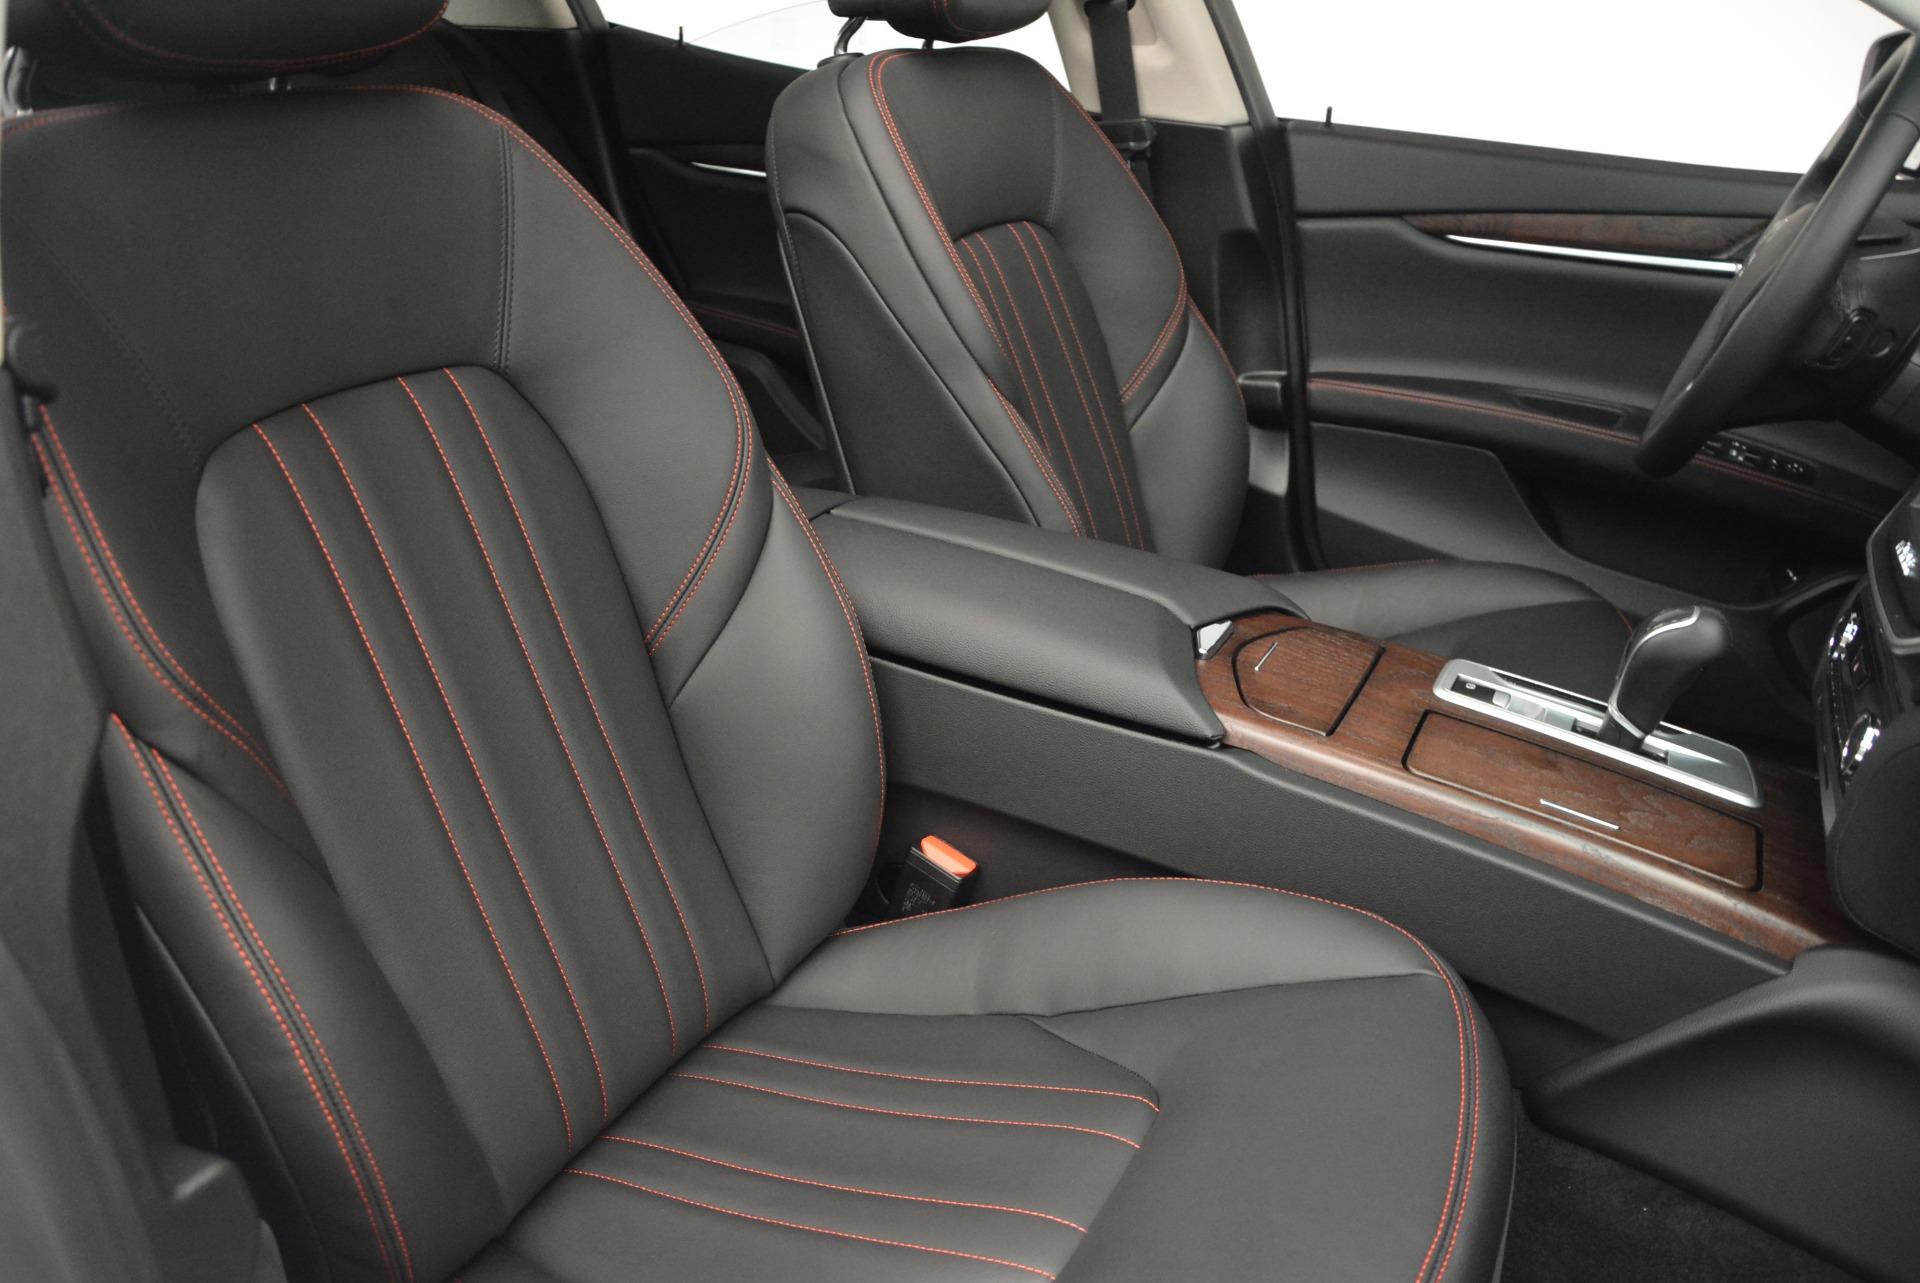 Used 2016 Maserati Ghibli S Q4  EX-LOANER For Sale In Greenwich, CT. Alfa Romeo of Greenwich, W252 669_p21